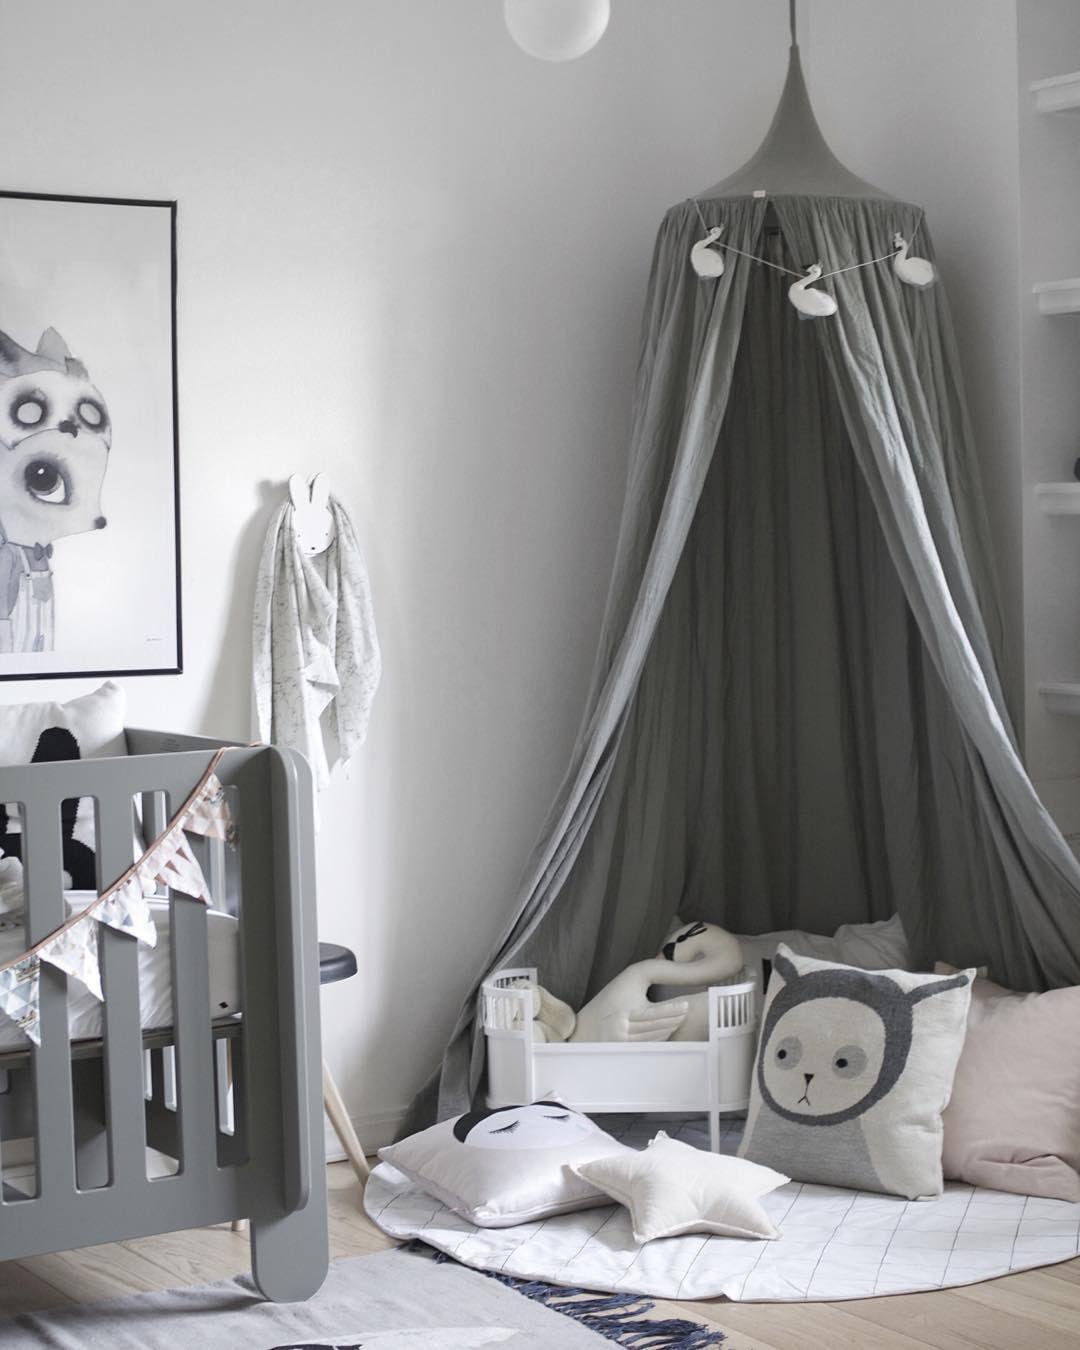 Our Little Baby Boy S Neutral Room: Kenziepoo's Little Baby Chloe's Room On Instagram. #kids